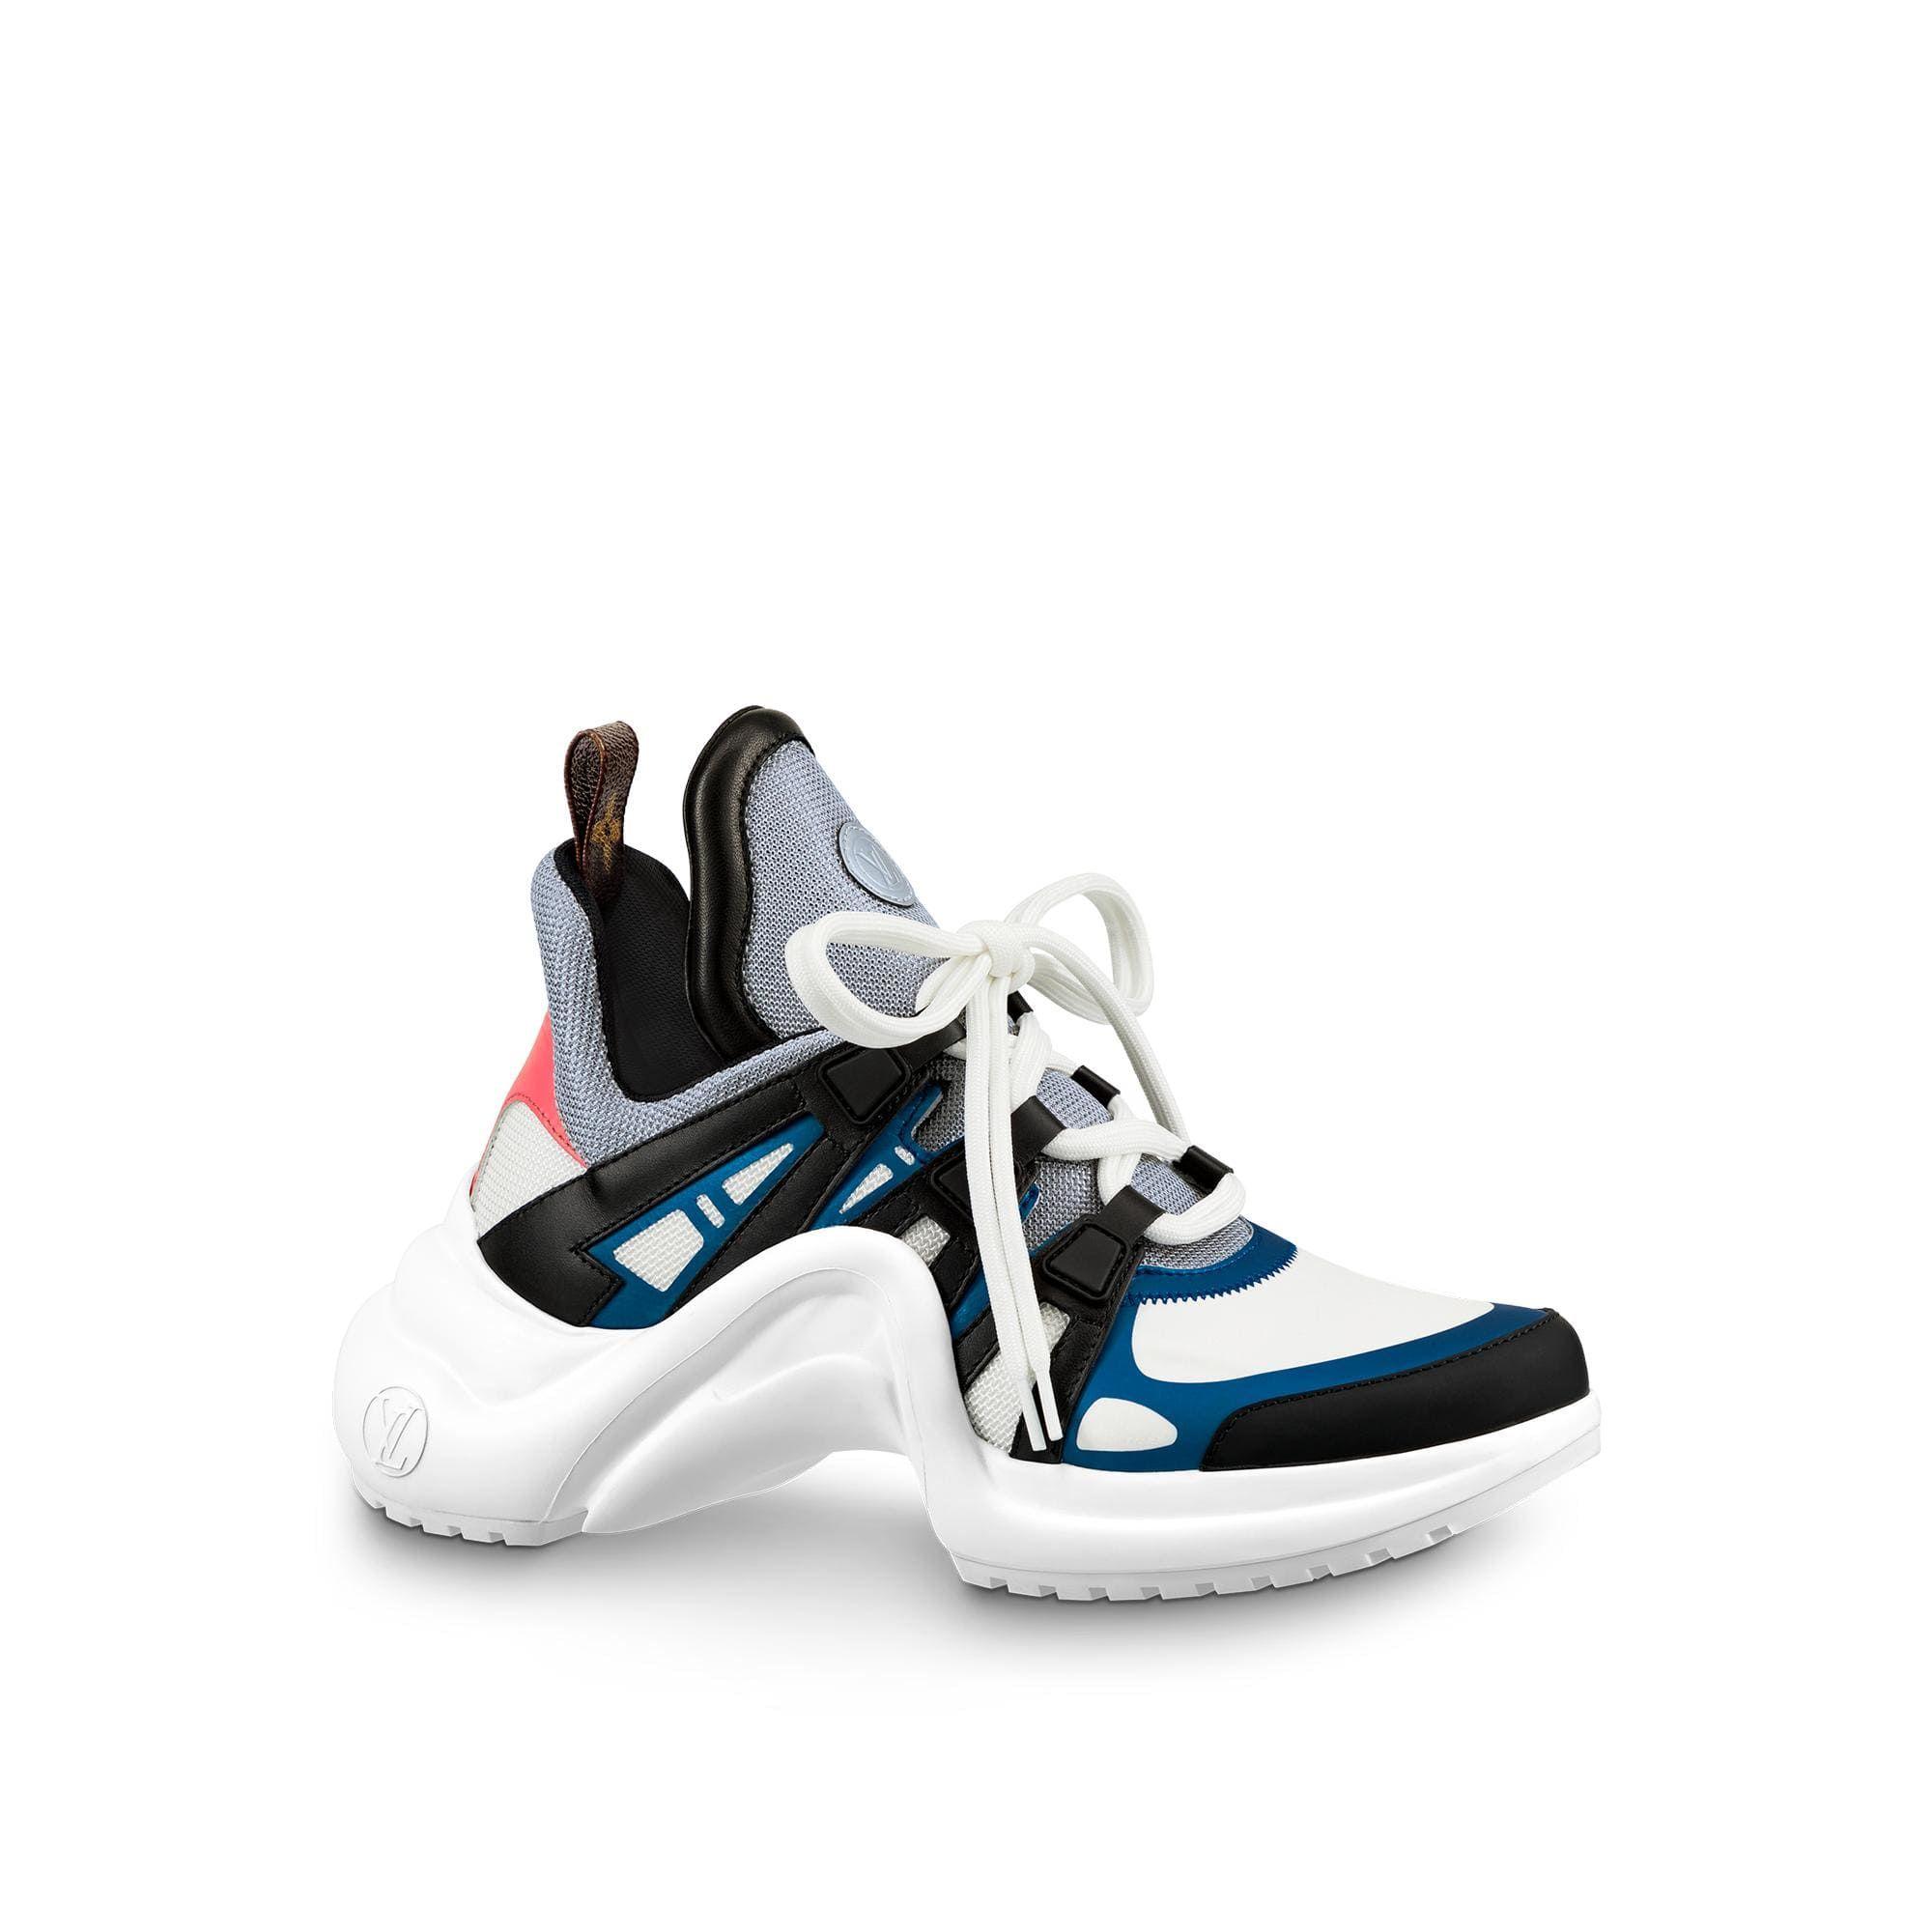 Lv Archlight Sneaker Via Louis Vuitton Louis Vuitton Sneaker Louis Vuitton Sneakers Women Louis Vuitton Sneakers